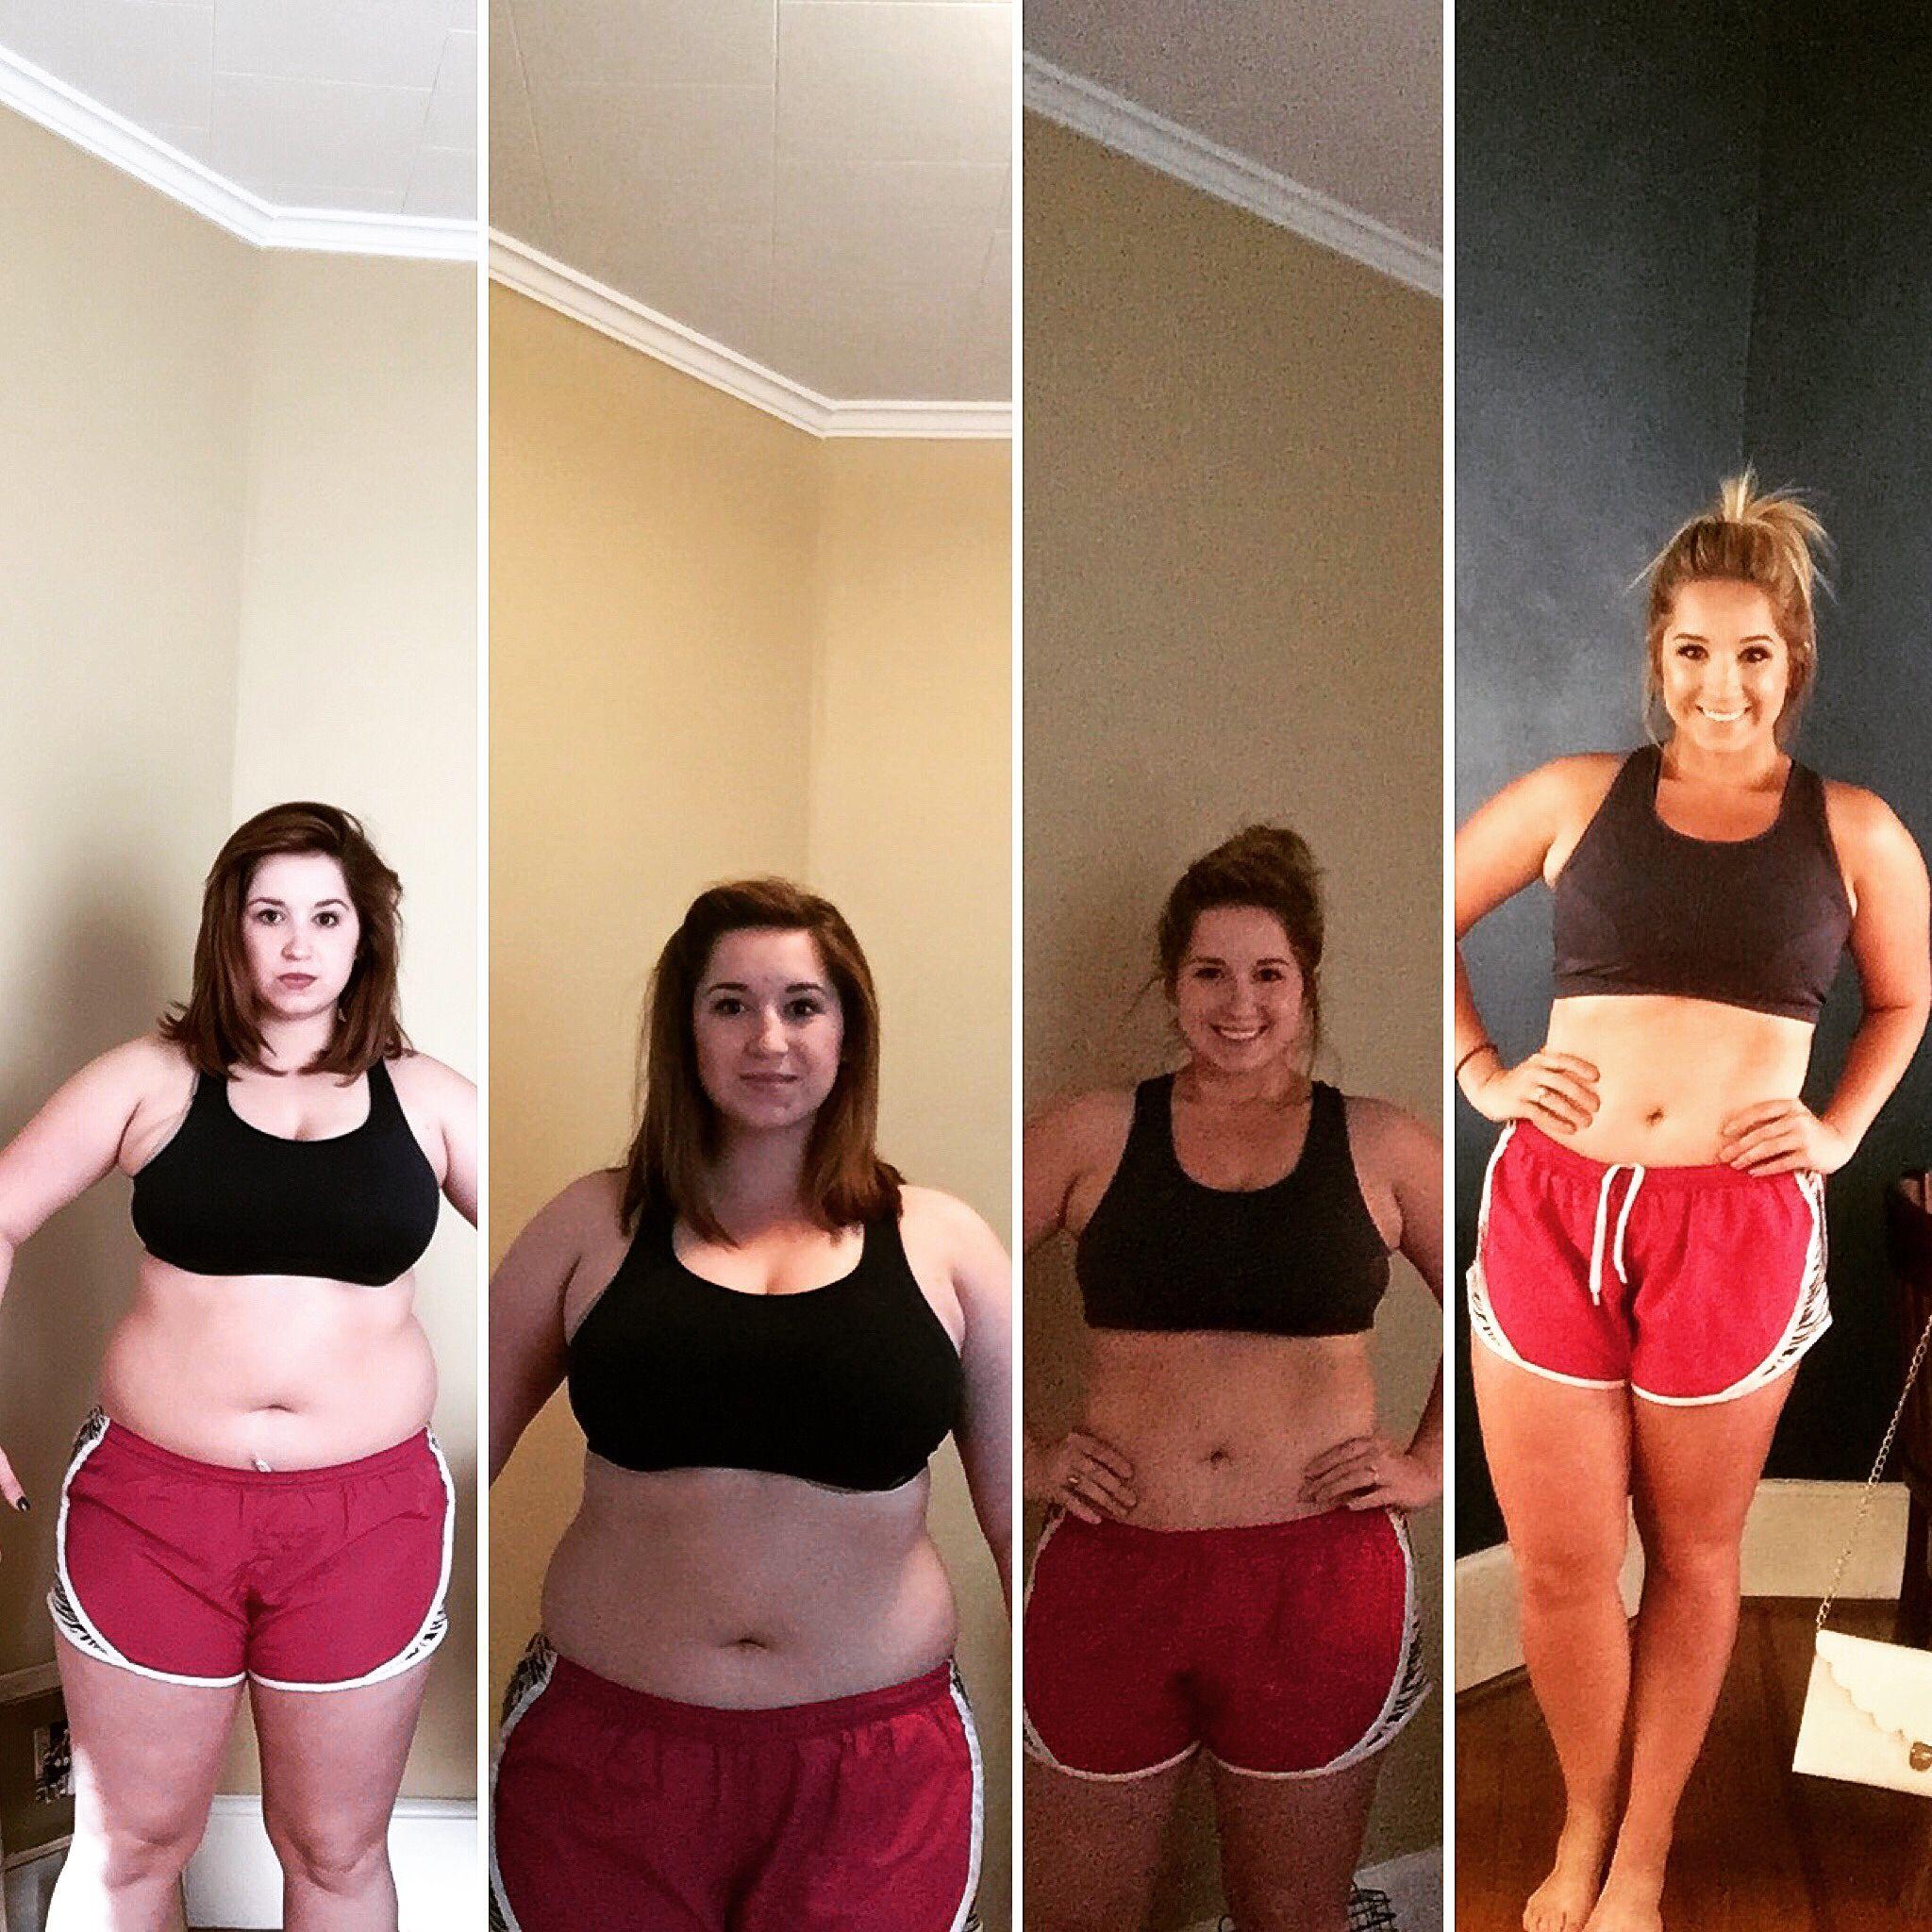 Картинки воодушевляющие на похудение, картинки